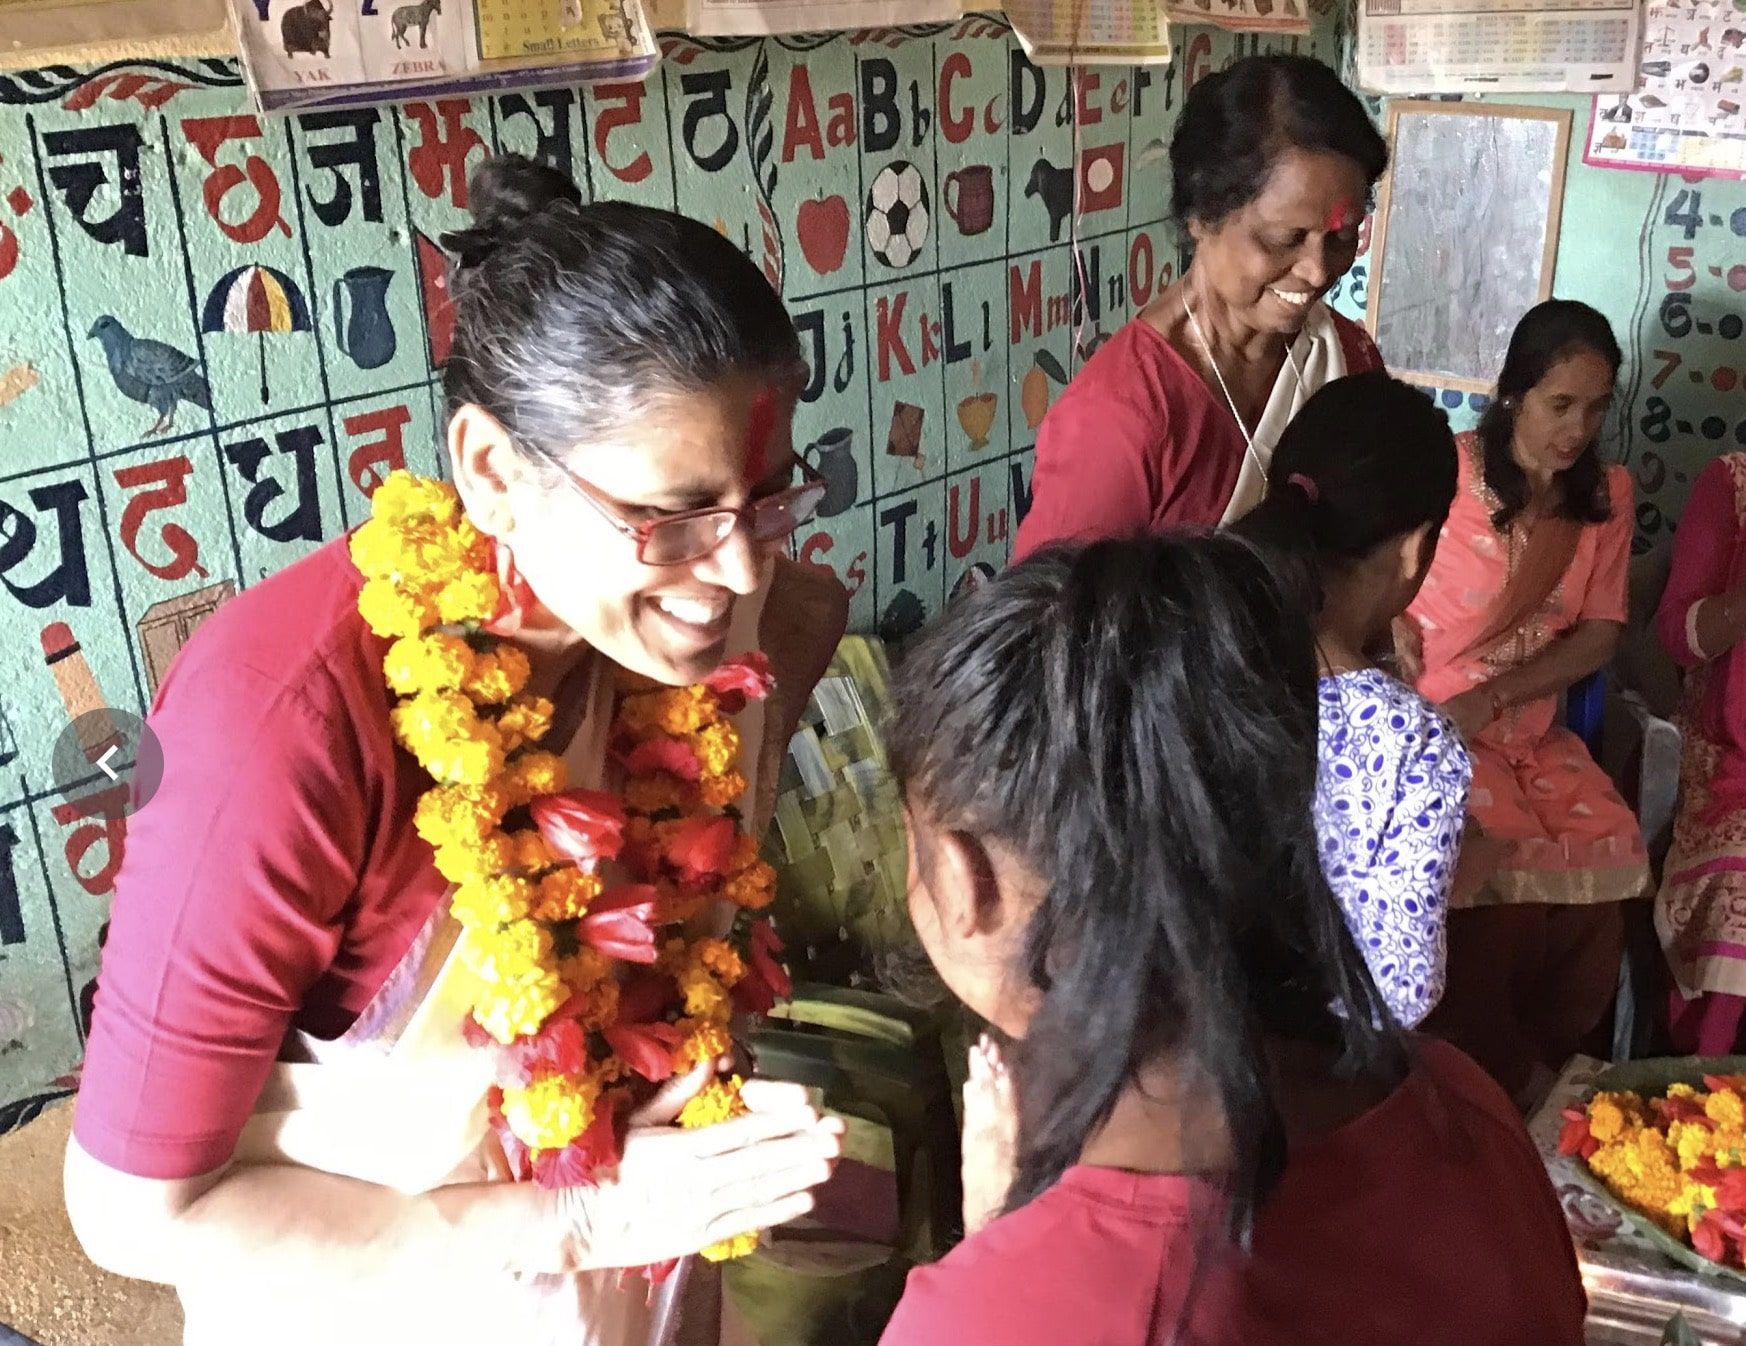 Sister Jacky visits Nepal missions